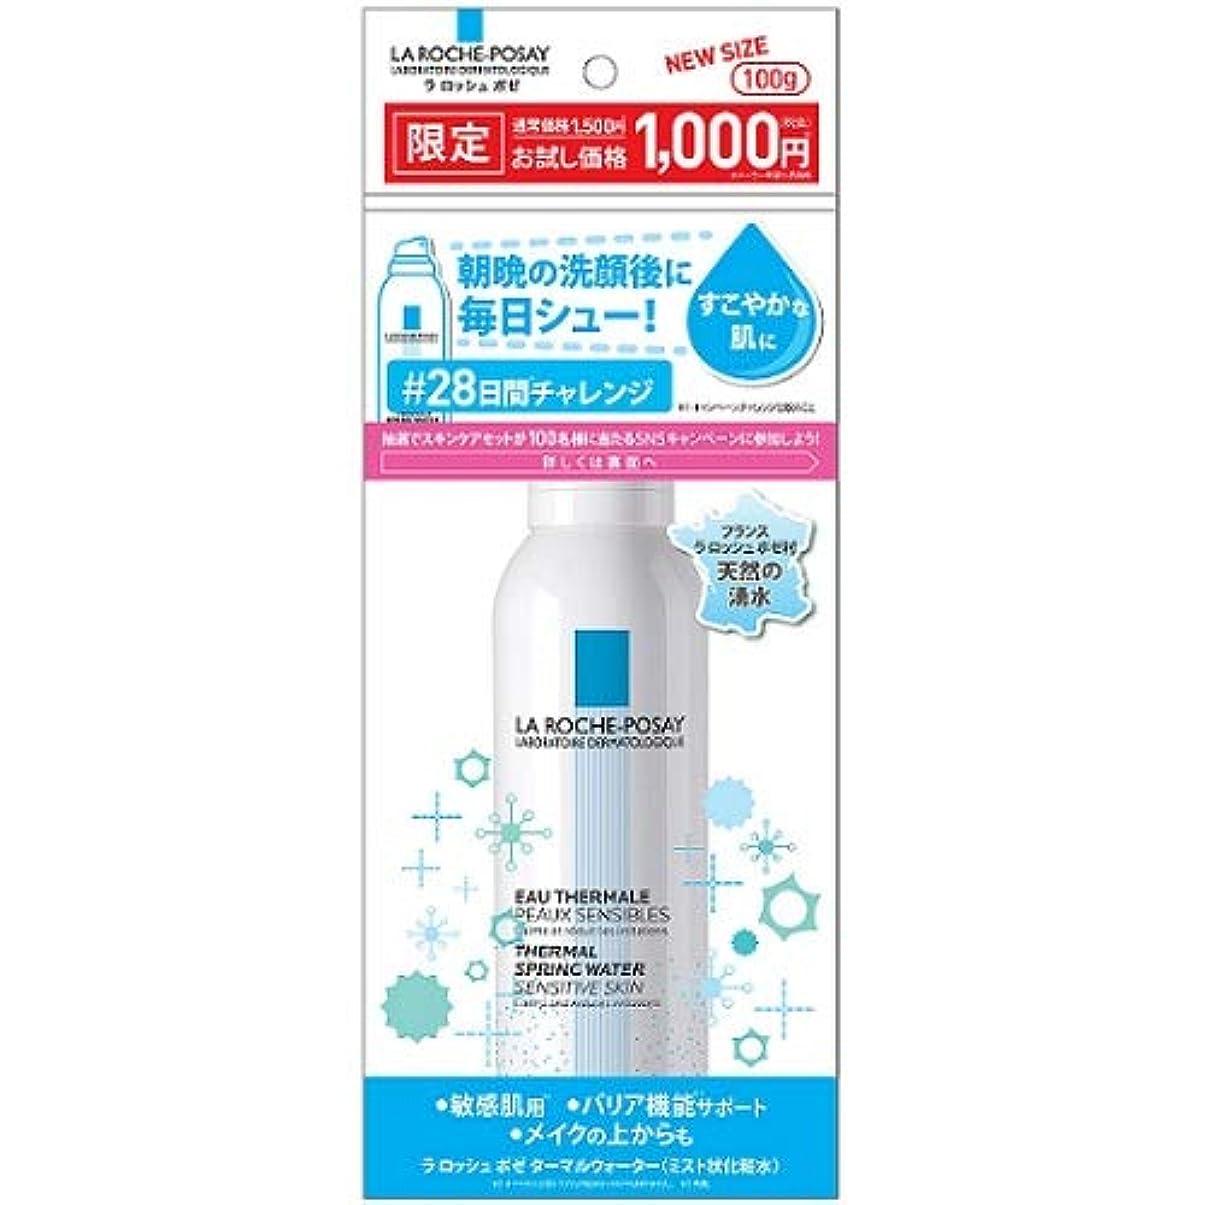 La Roche-Posay(ラロッシュポゼ) 【敏感肌用*ミスト状化粧水】ターマルウォーター100g限定価格キット